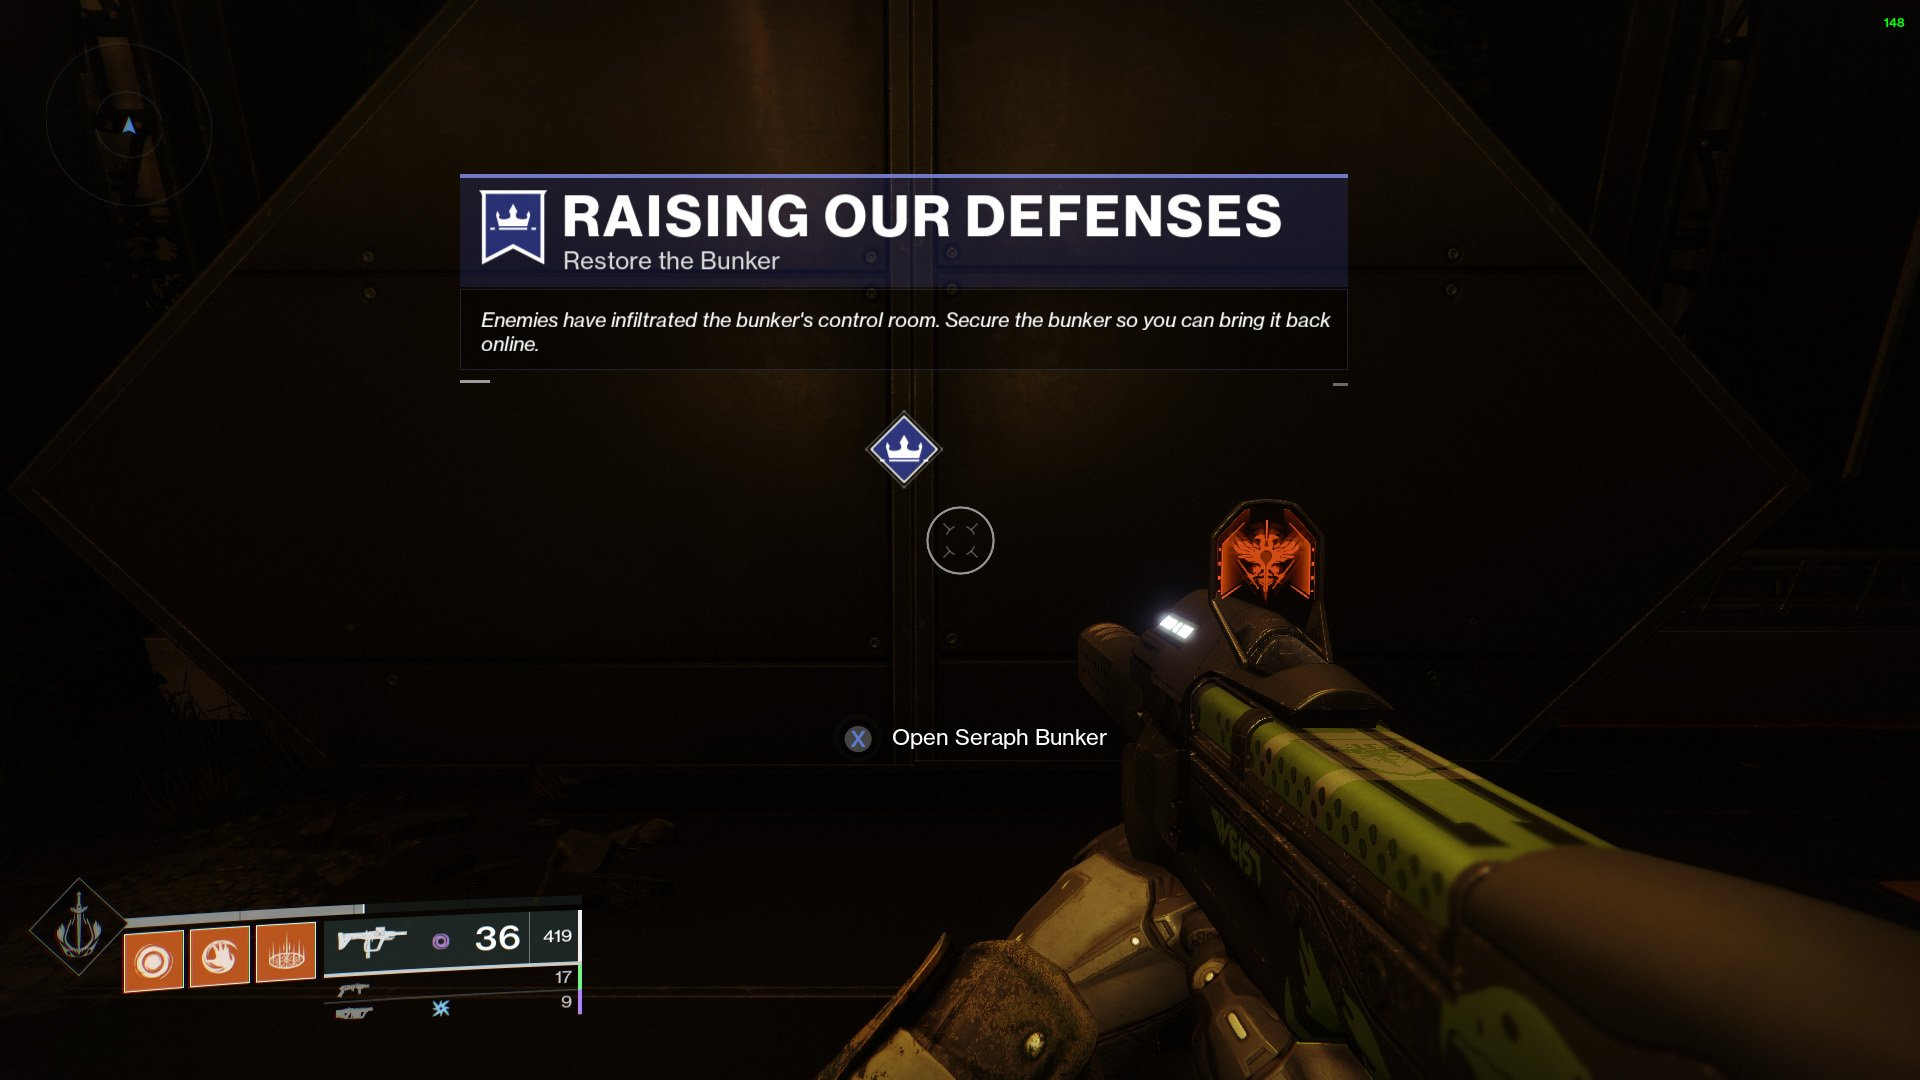 Destiny 2 Restore the Bunker